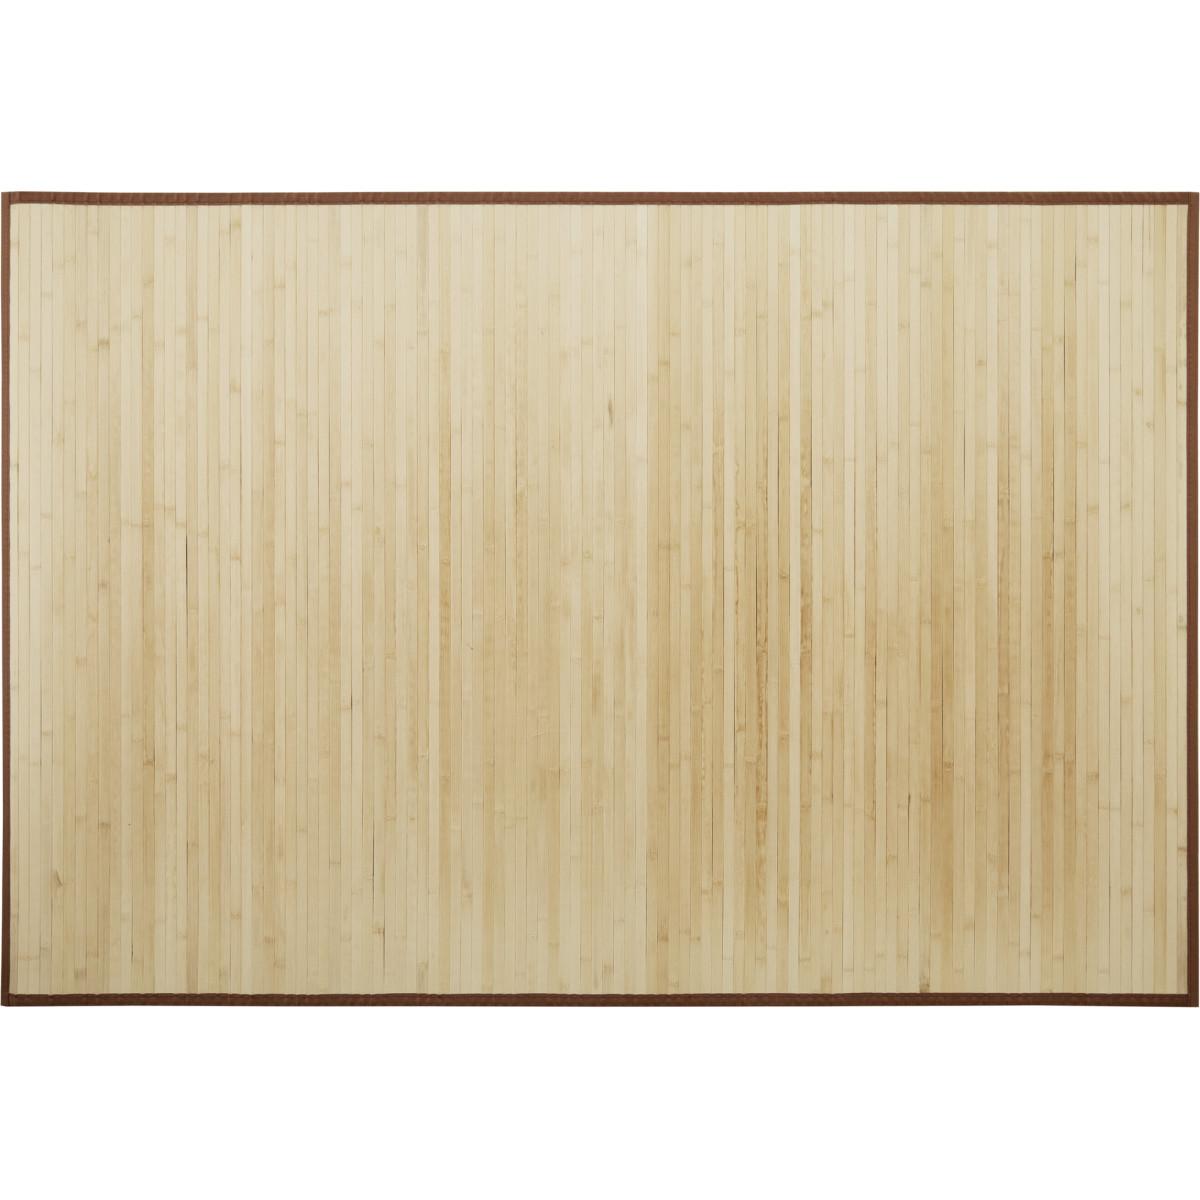 Циновка 120x180 см бамбук цвет бежевый